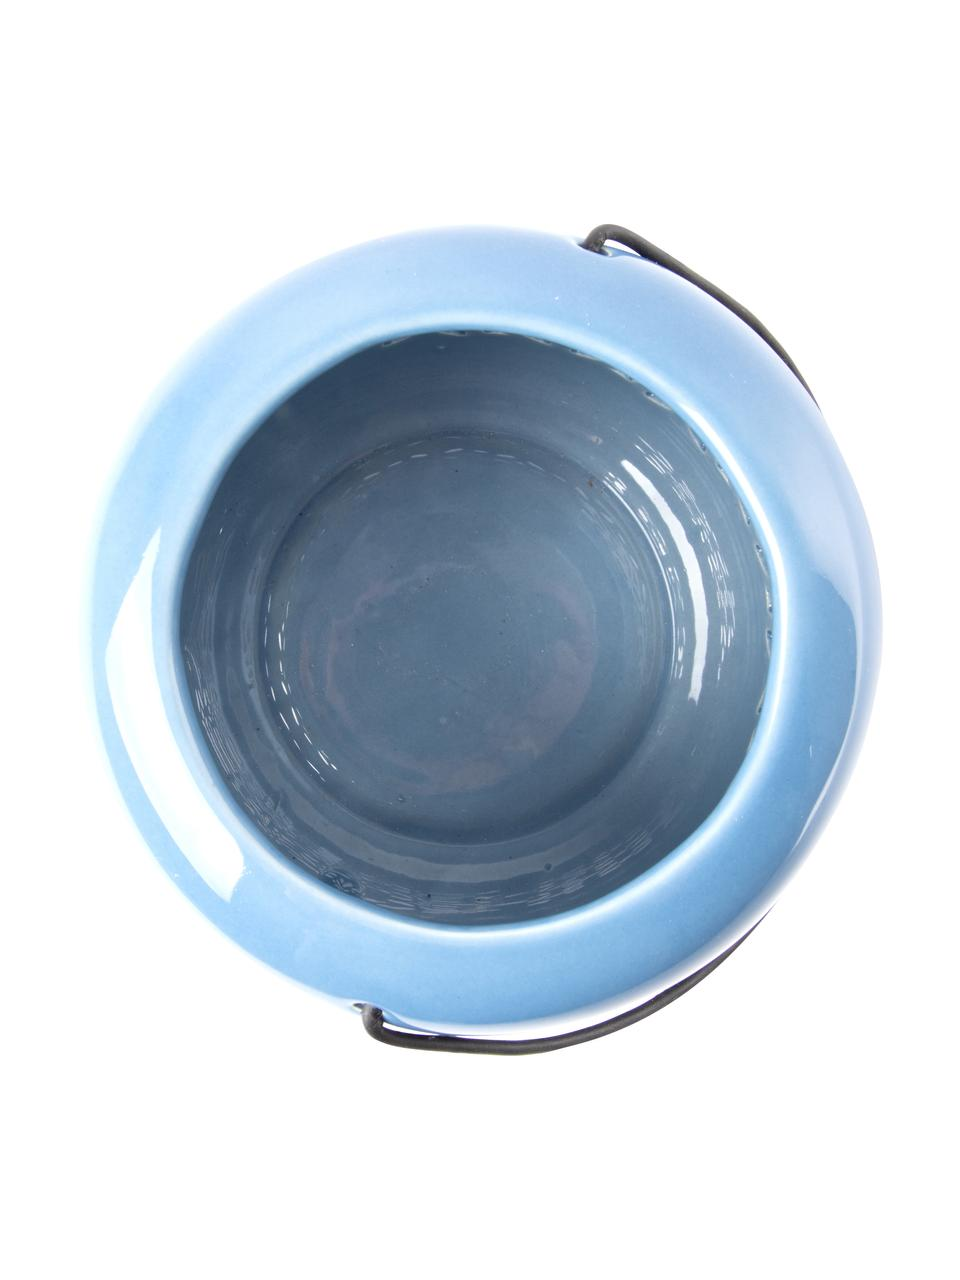 Teelichthalter-Set Shades, 3-tlg., Griff: Metall, Blau, Ø 12 x H 14 cm